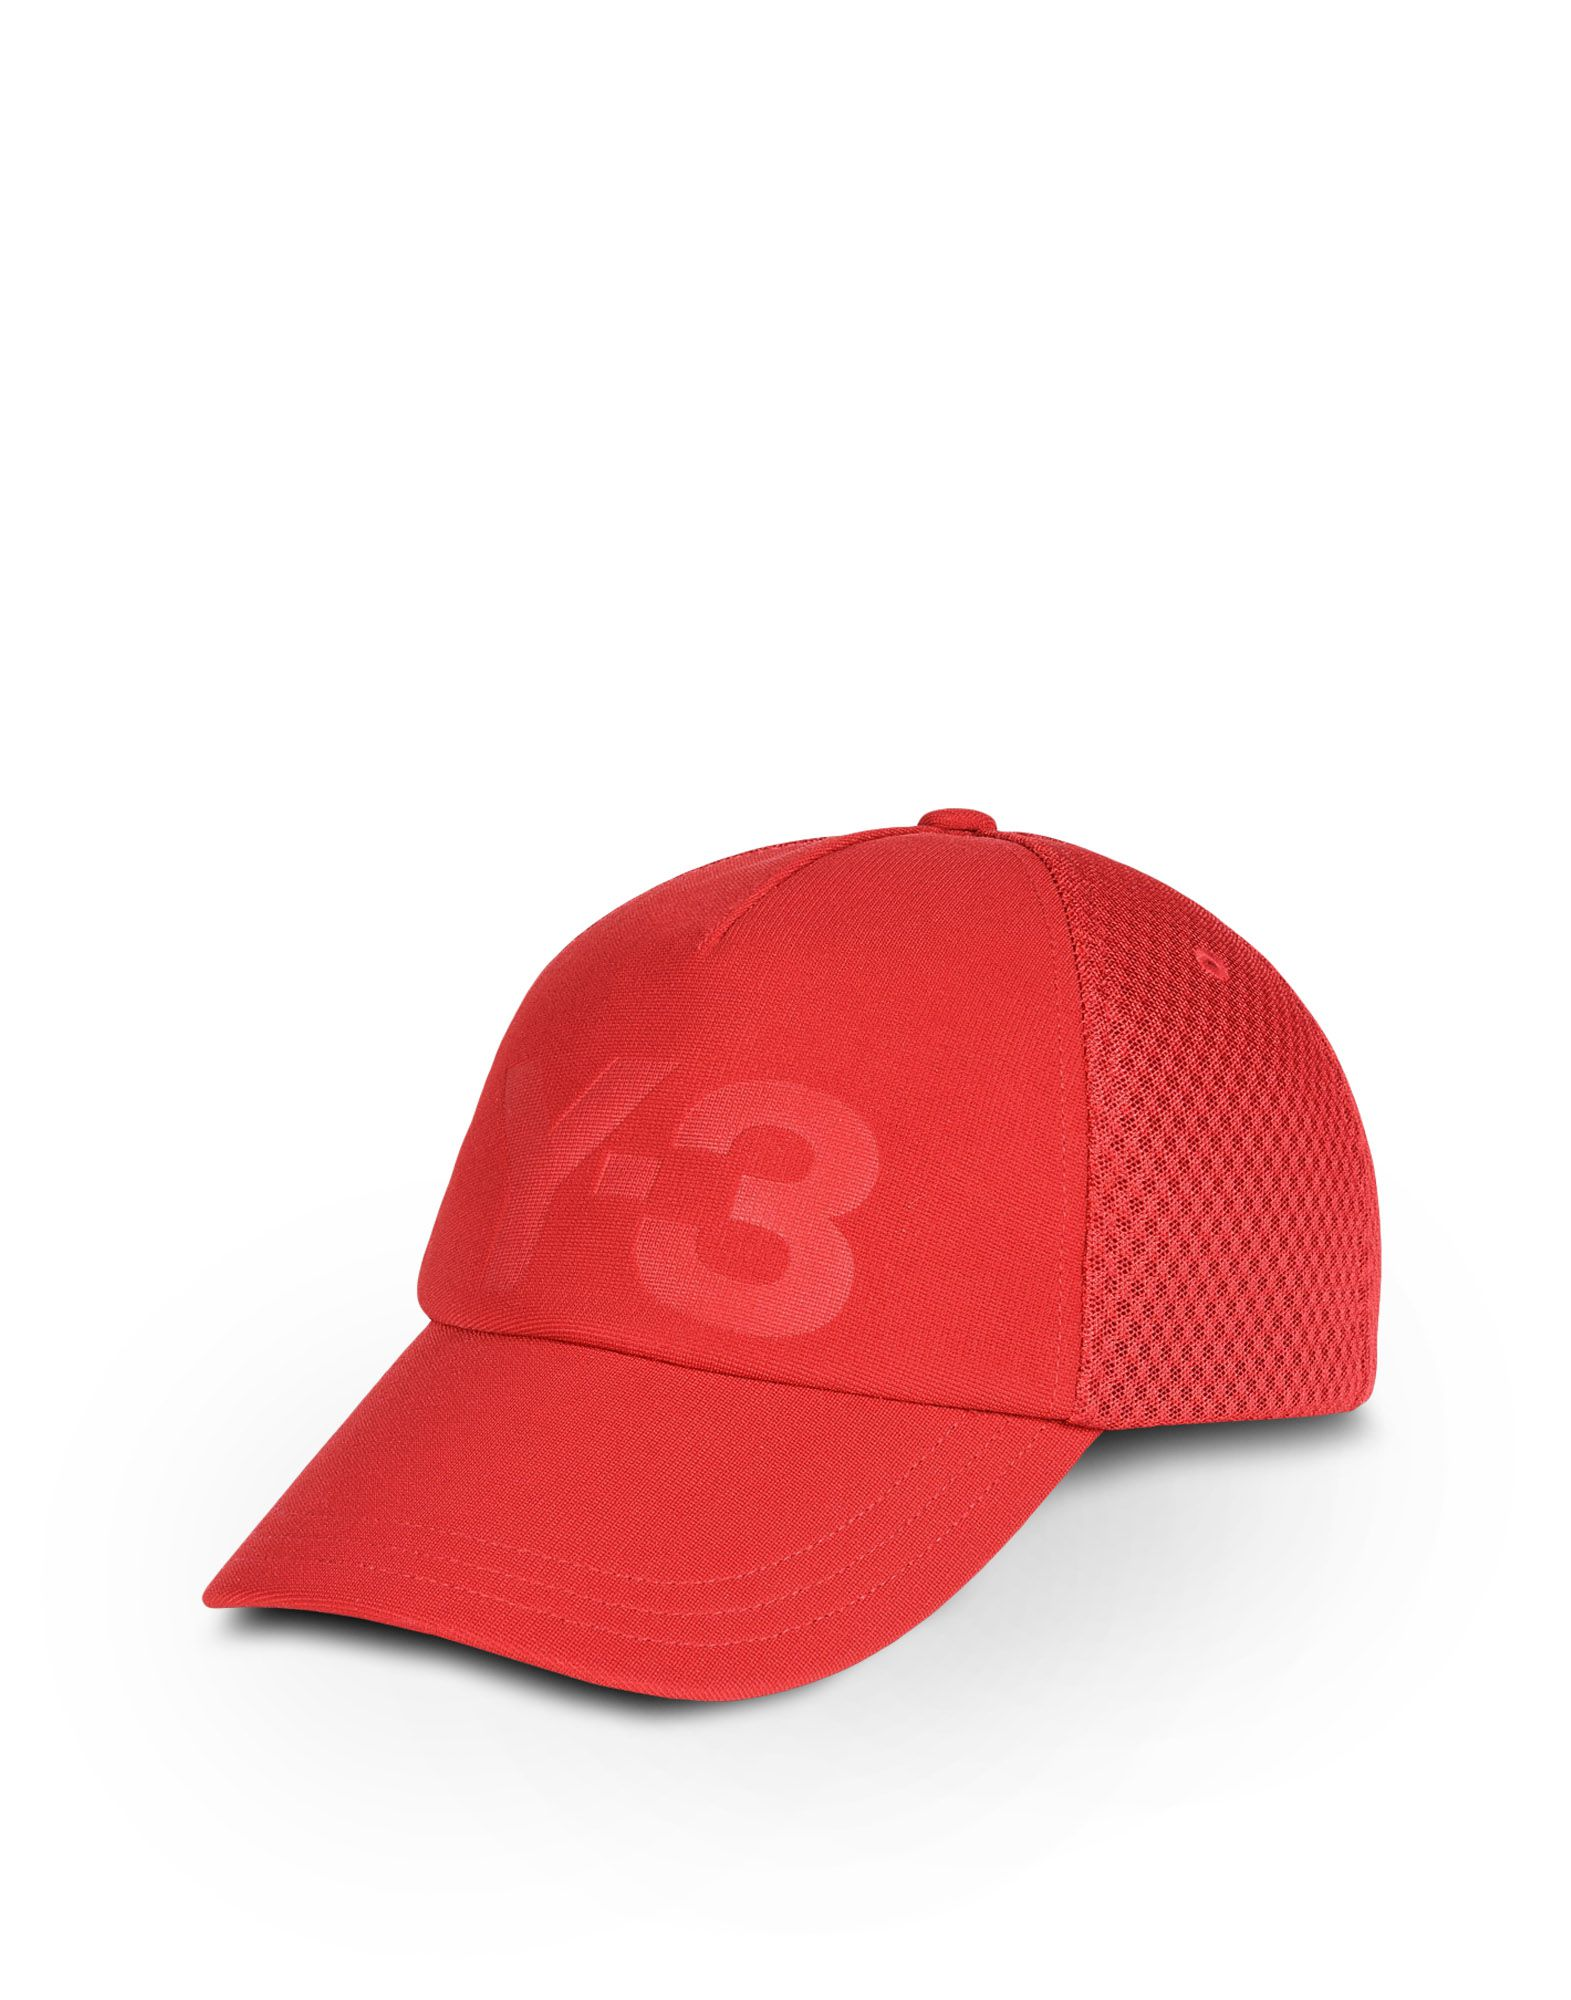 Y-3 TRUCKER CAP OTHER ACCESSORIES unisex Y-3 adidas